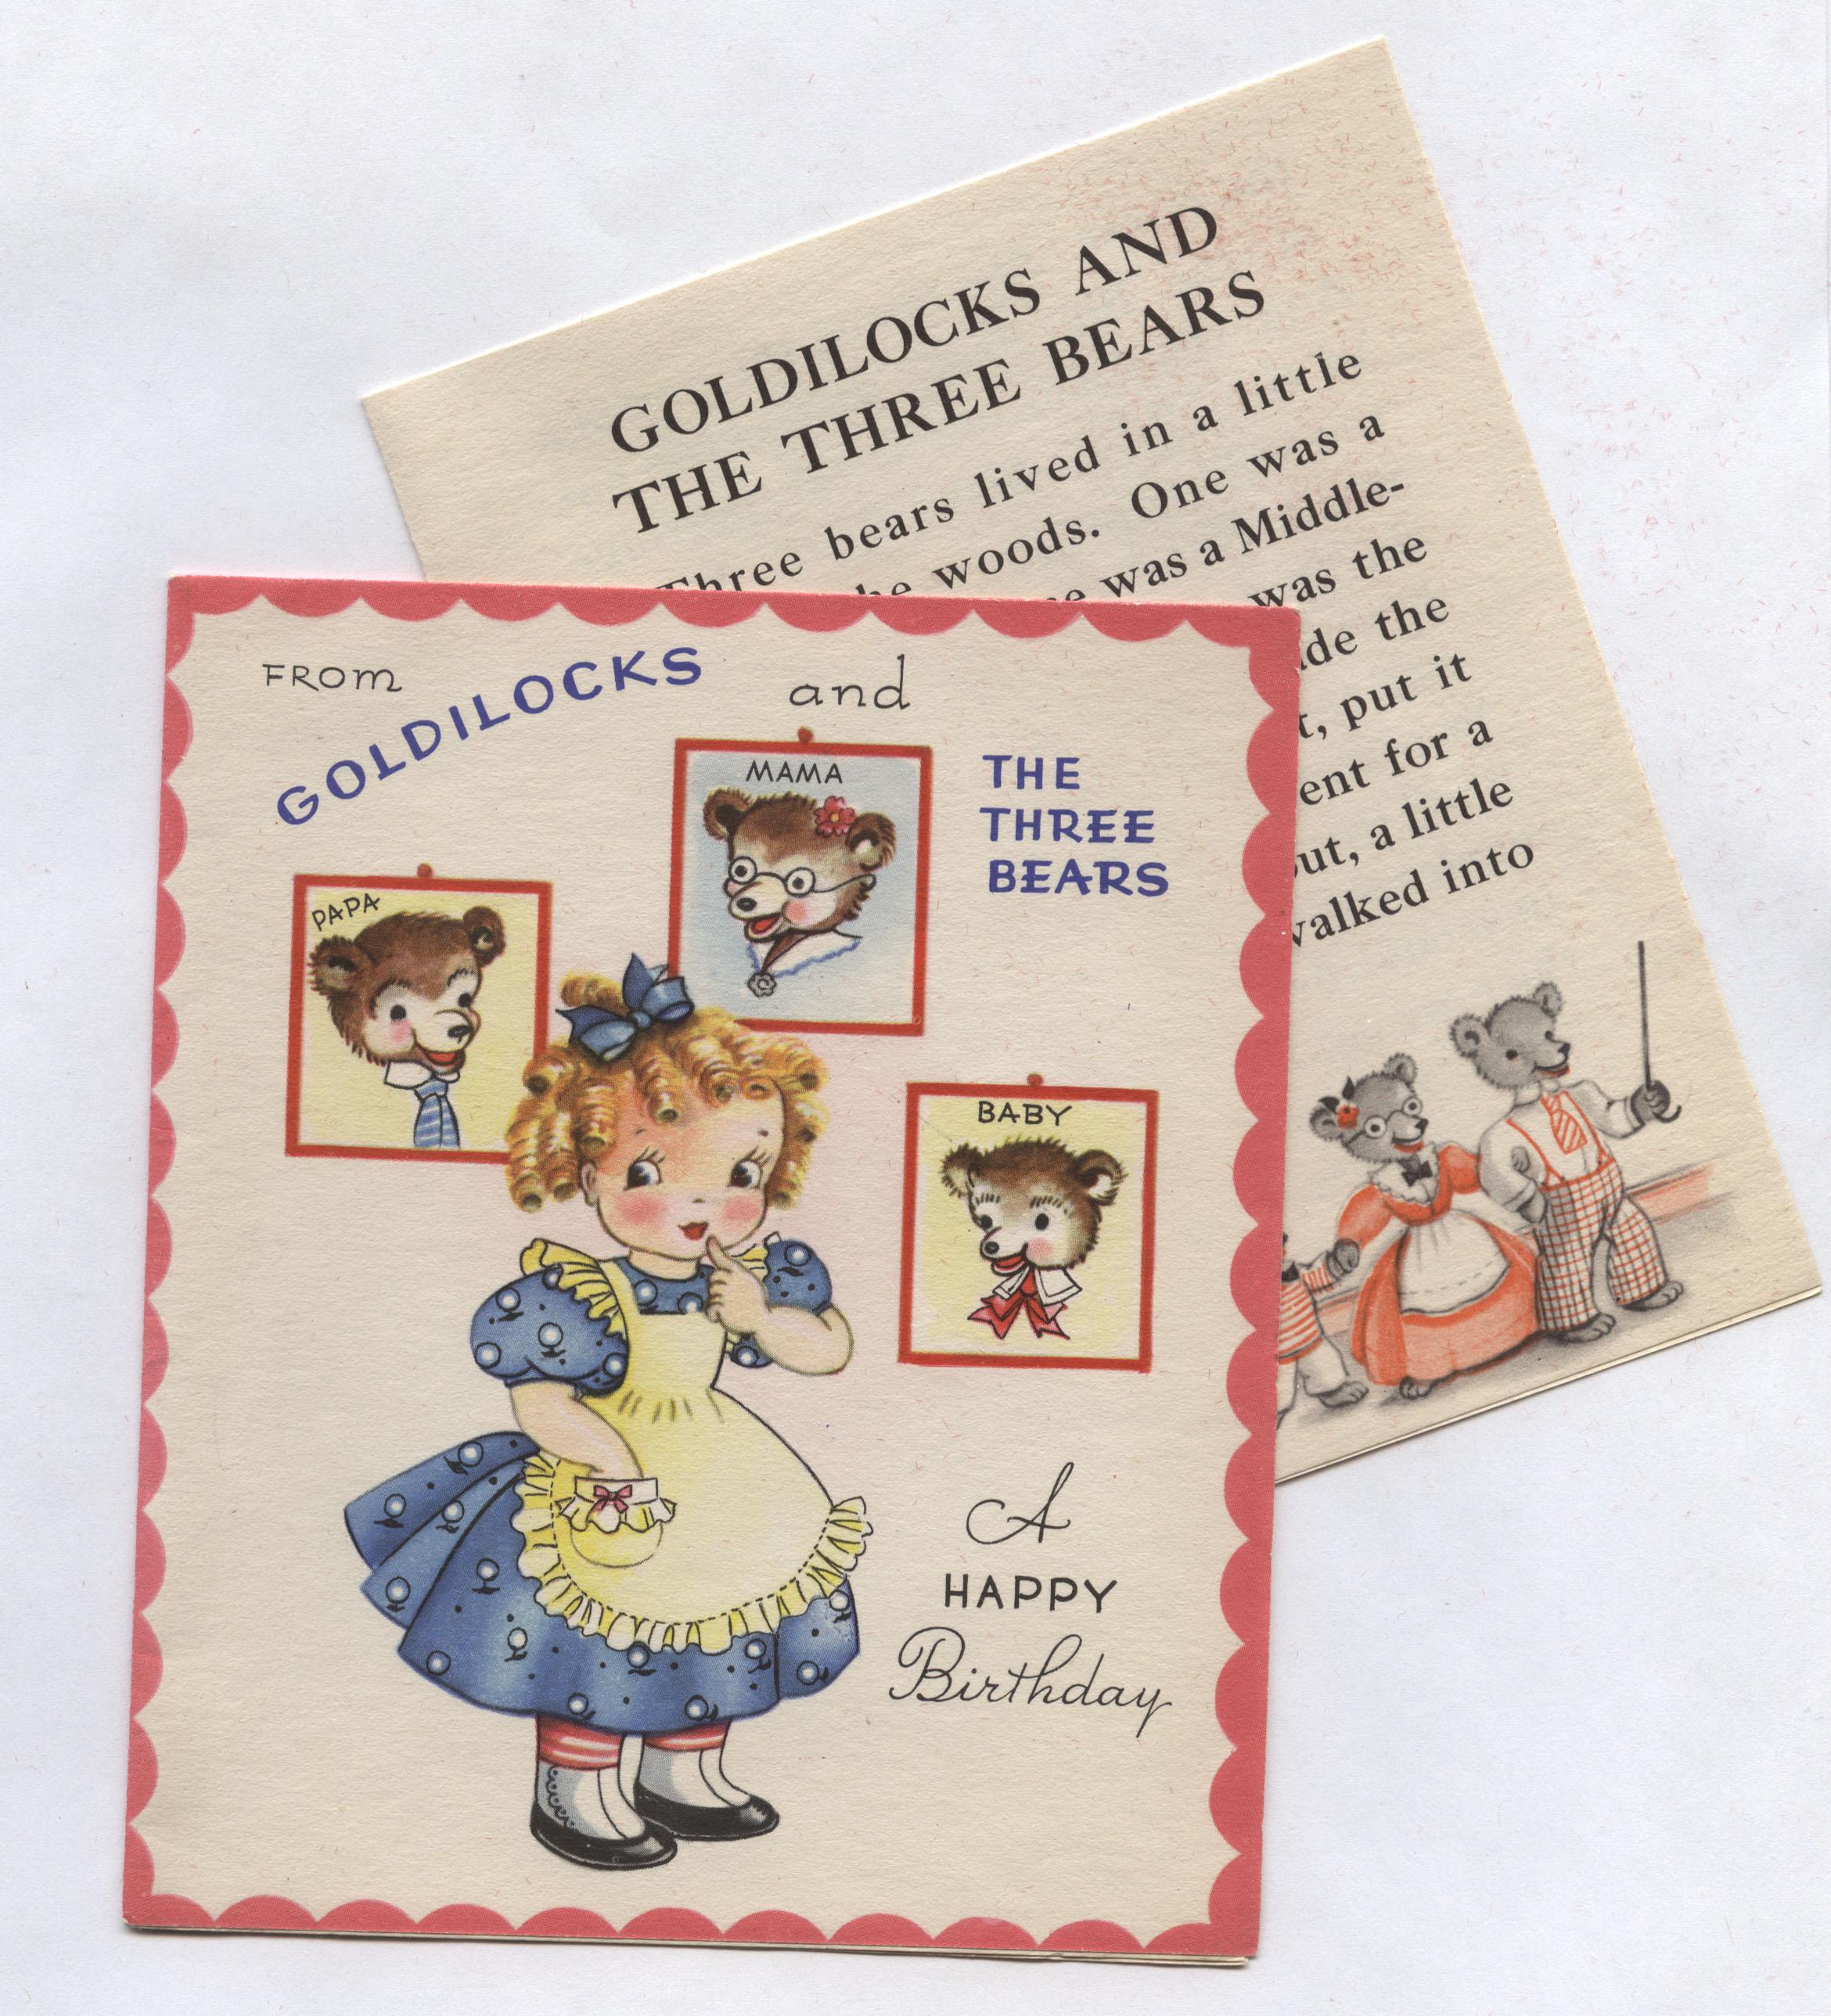 Vintage Birthday Greetings From Goldilocks The Three Bears